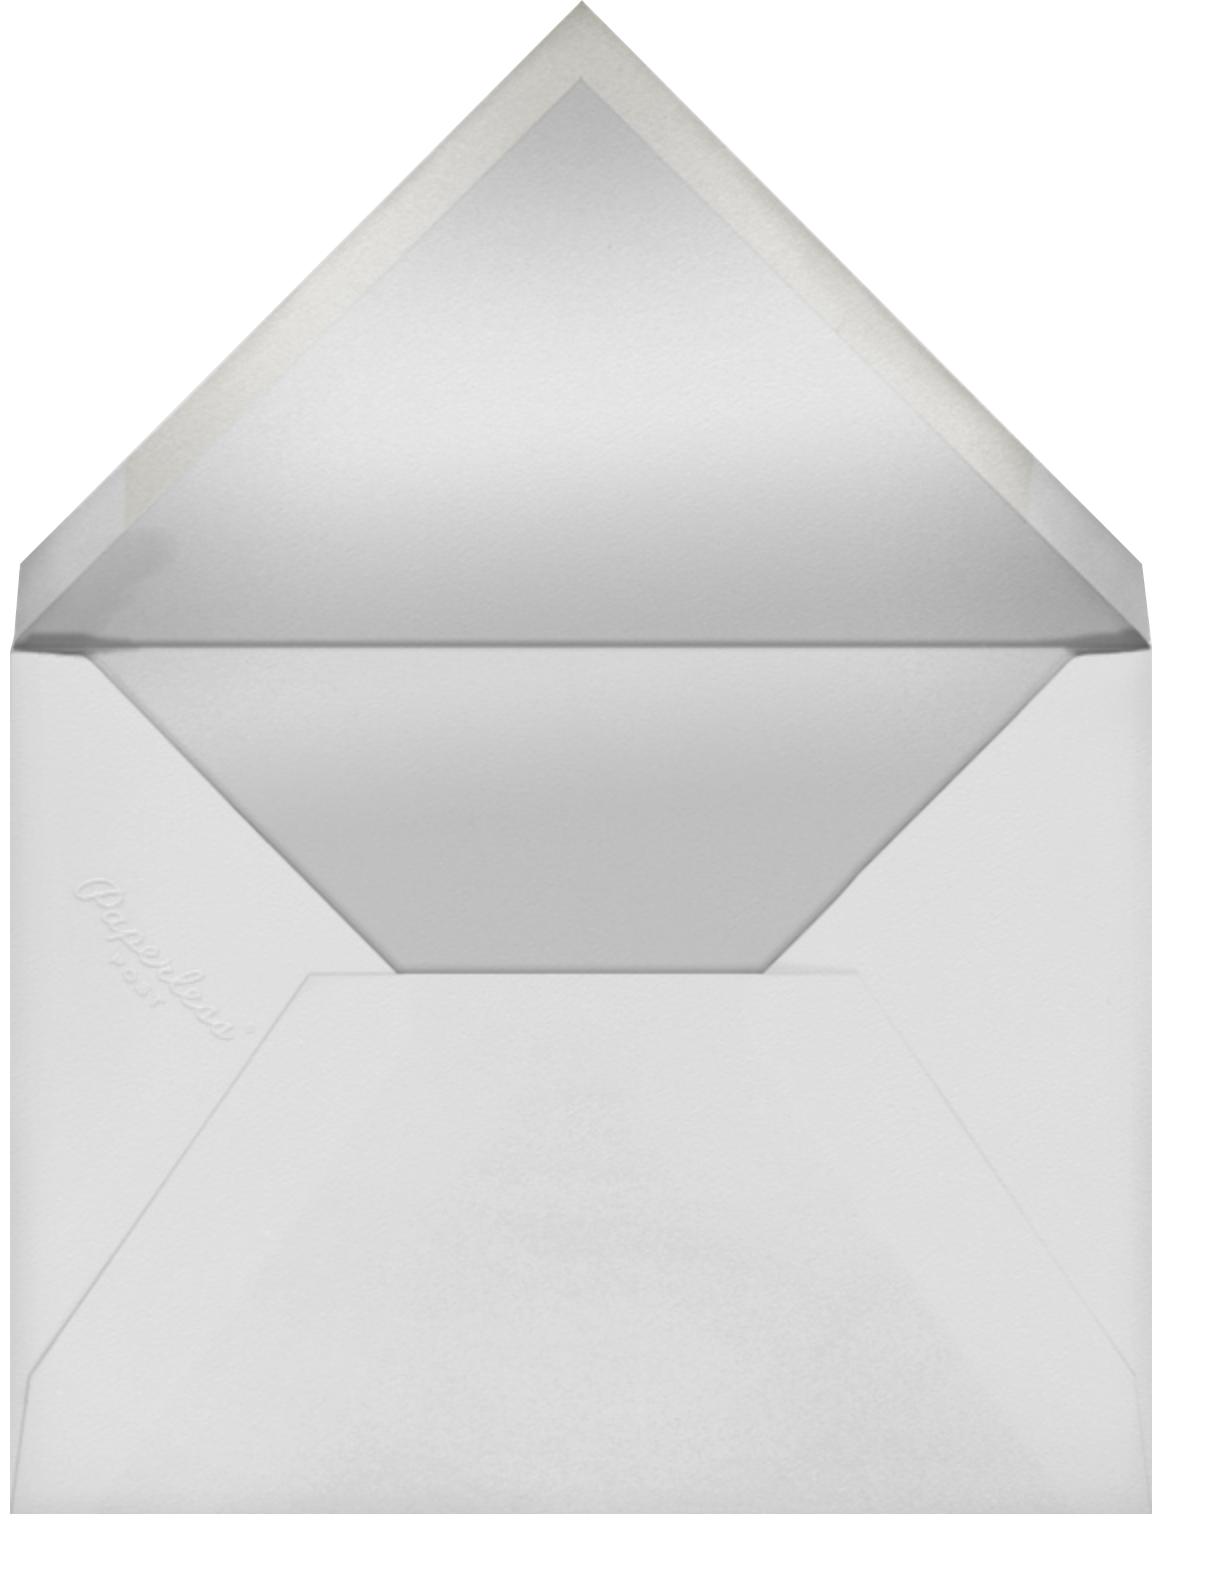 Gradient Border - Black - Paperless Post - Adult birthday - envelope back